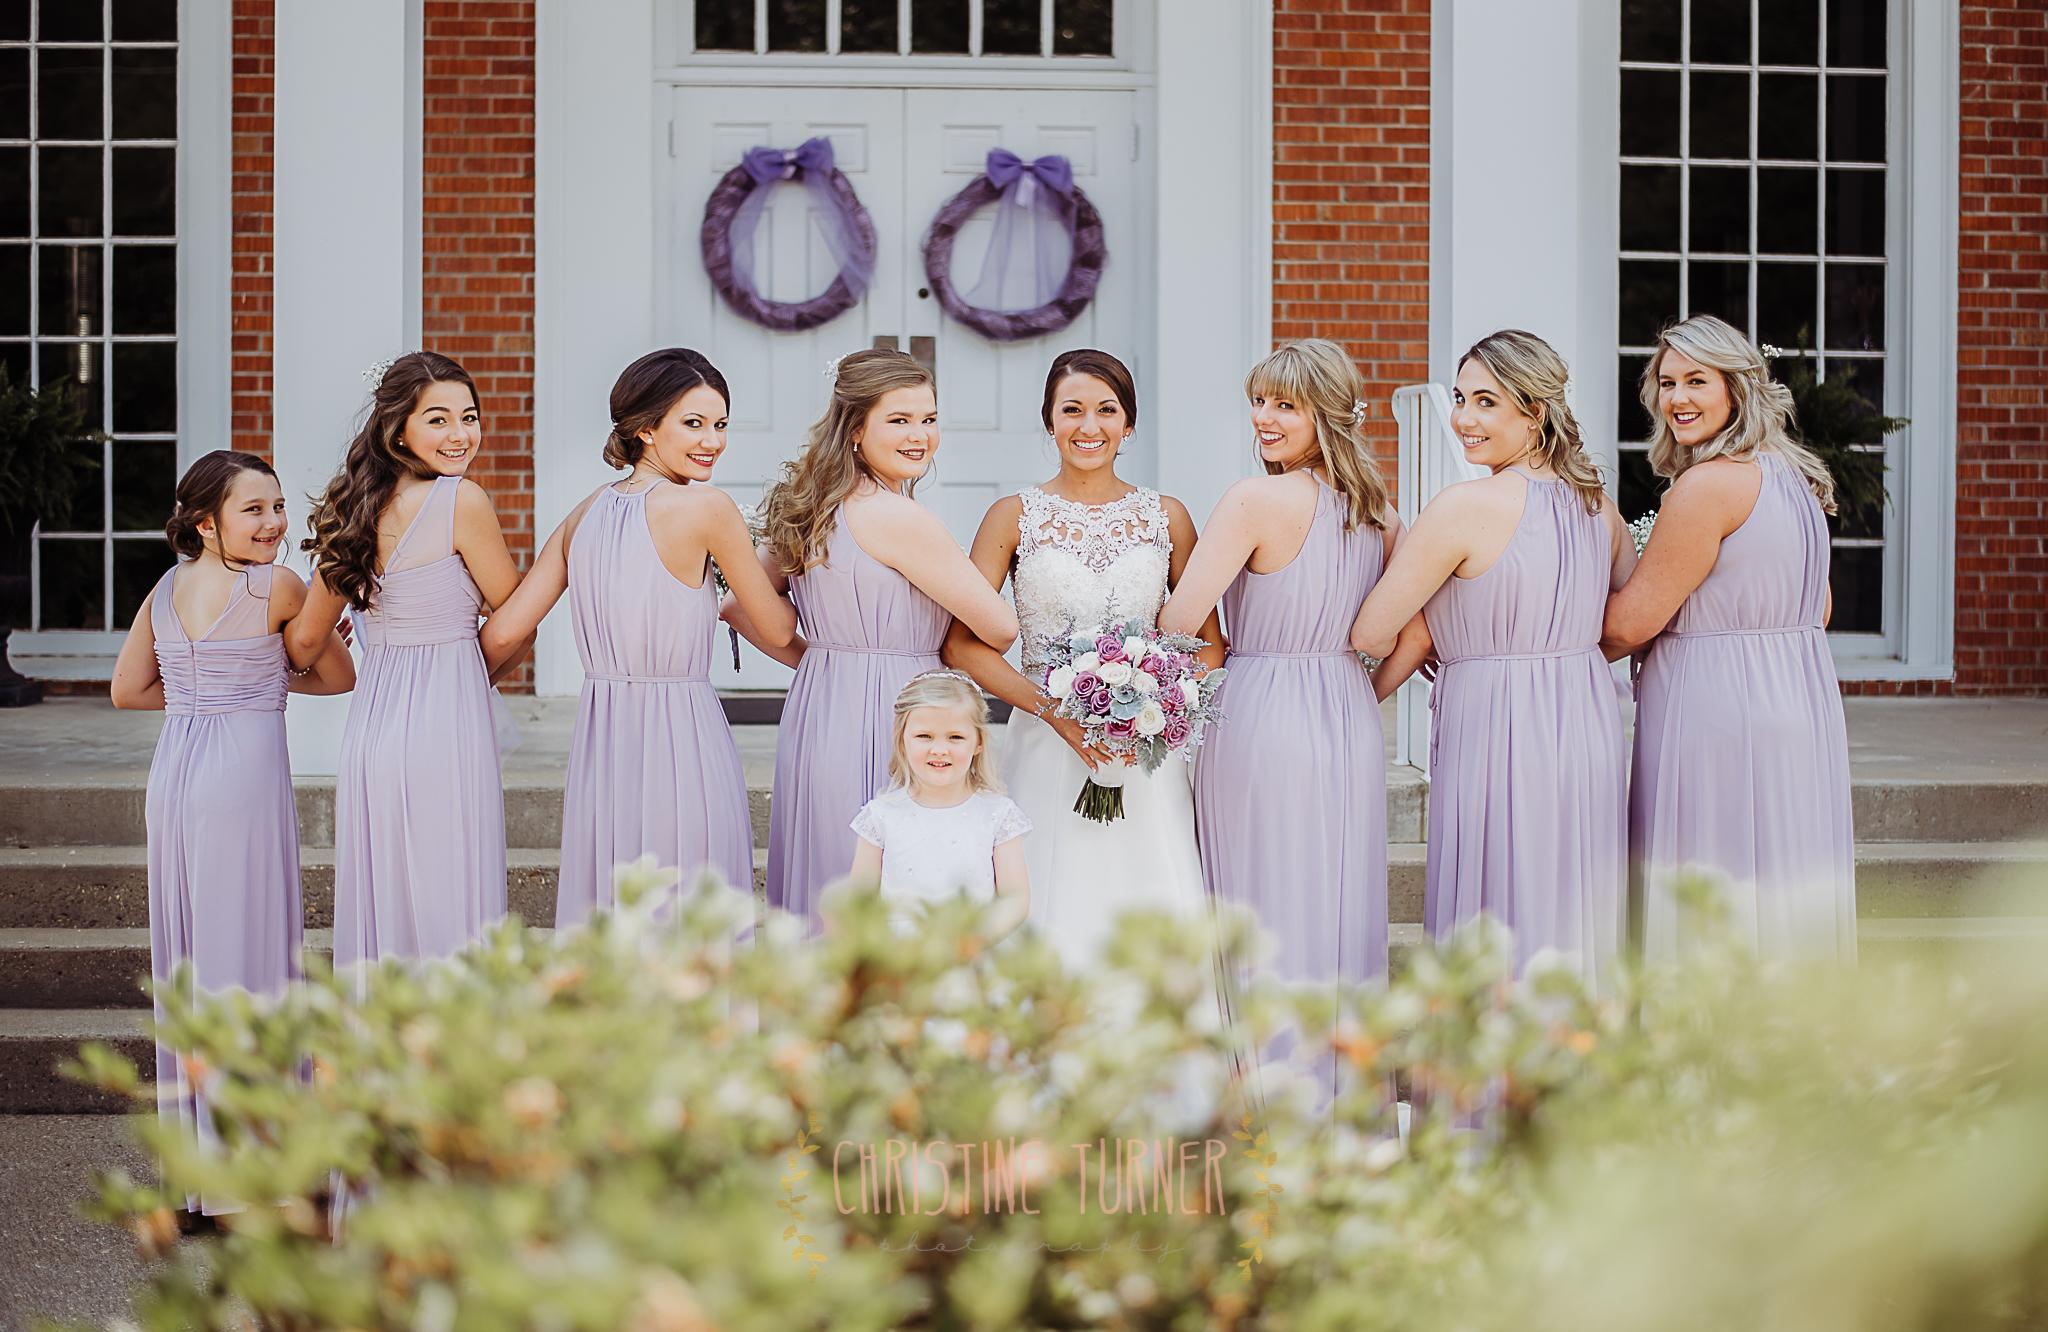 Johnston Wedding (3 of 3)